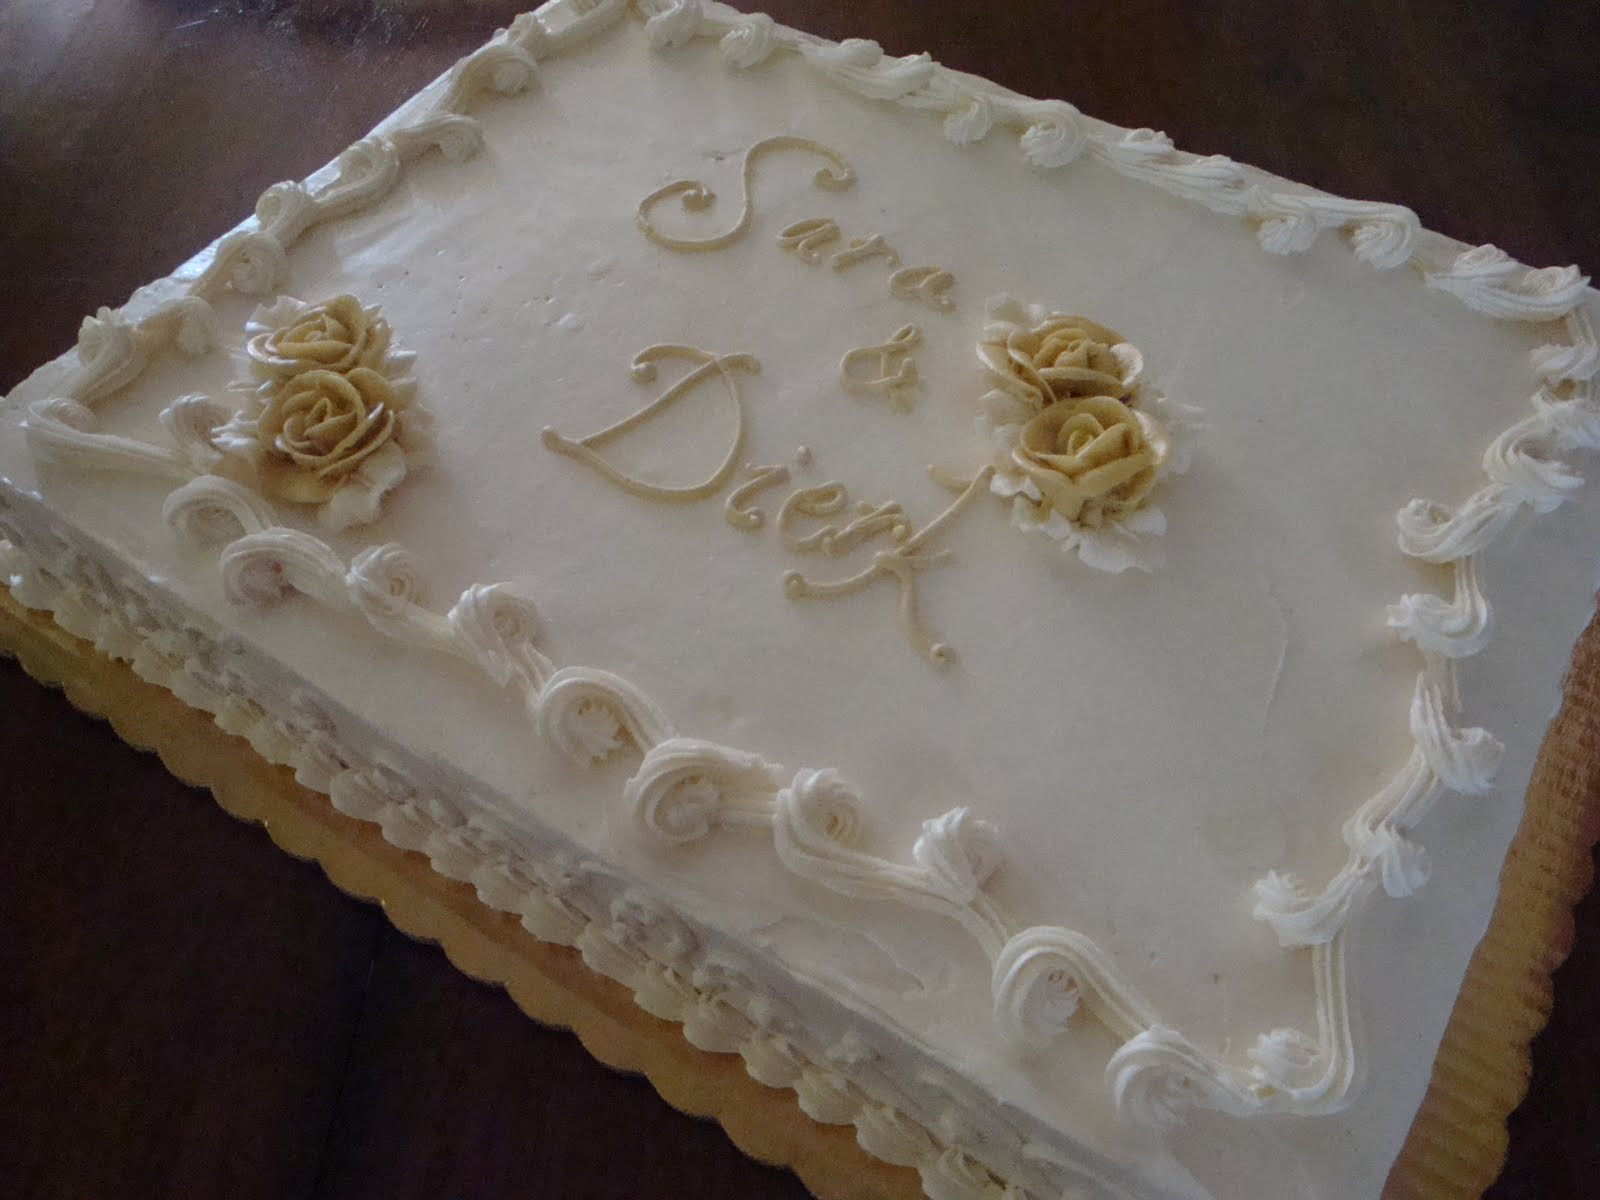 Wedding Sheet Cake  The Jaded Spoon Sara s Wedding Cakes